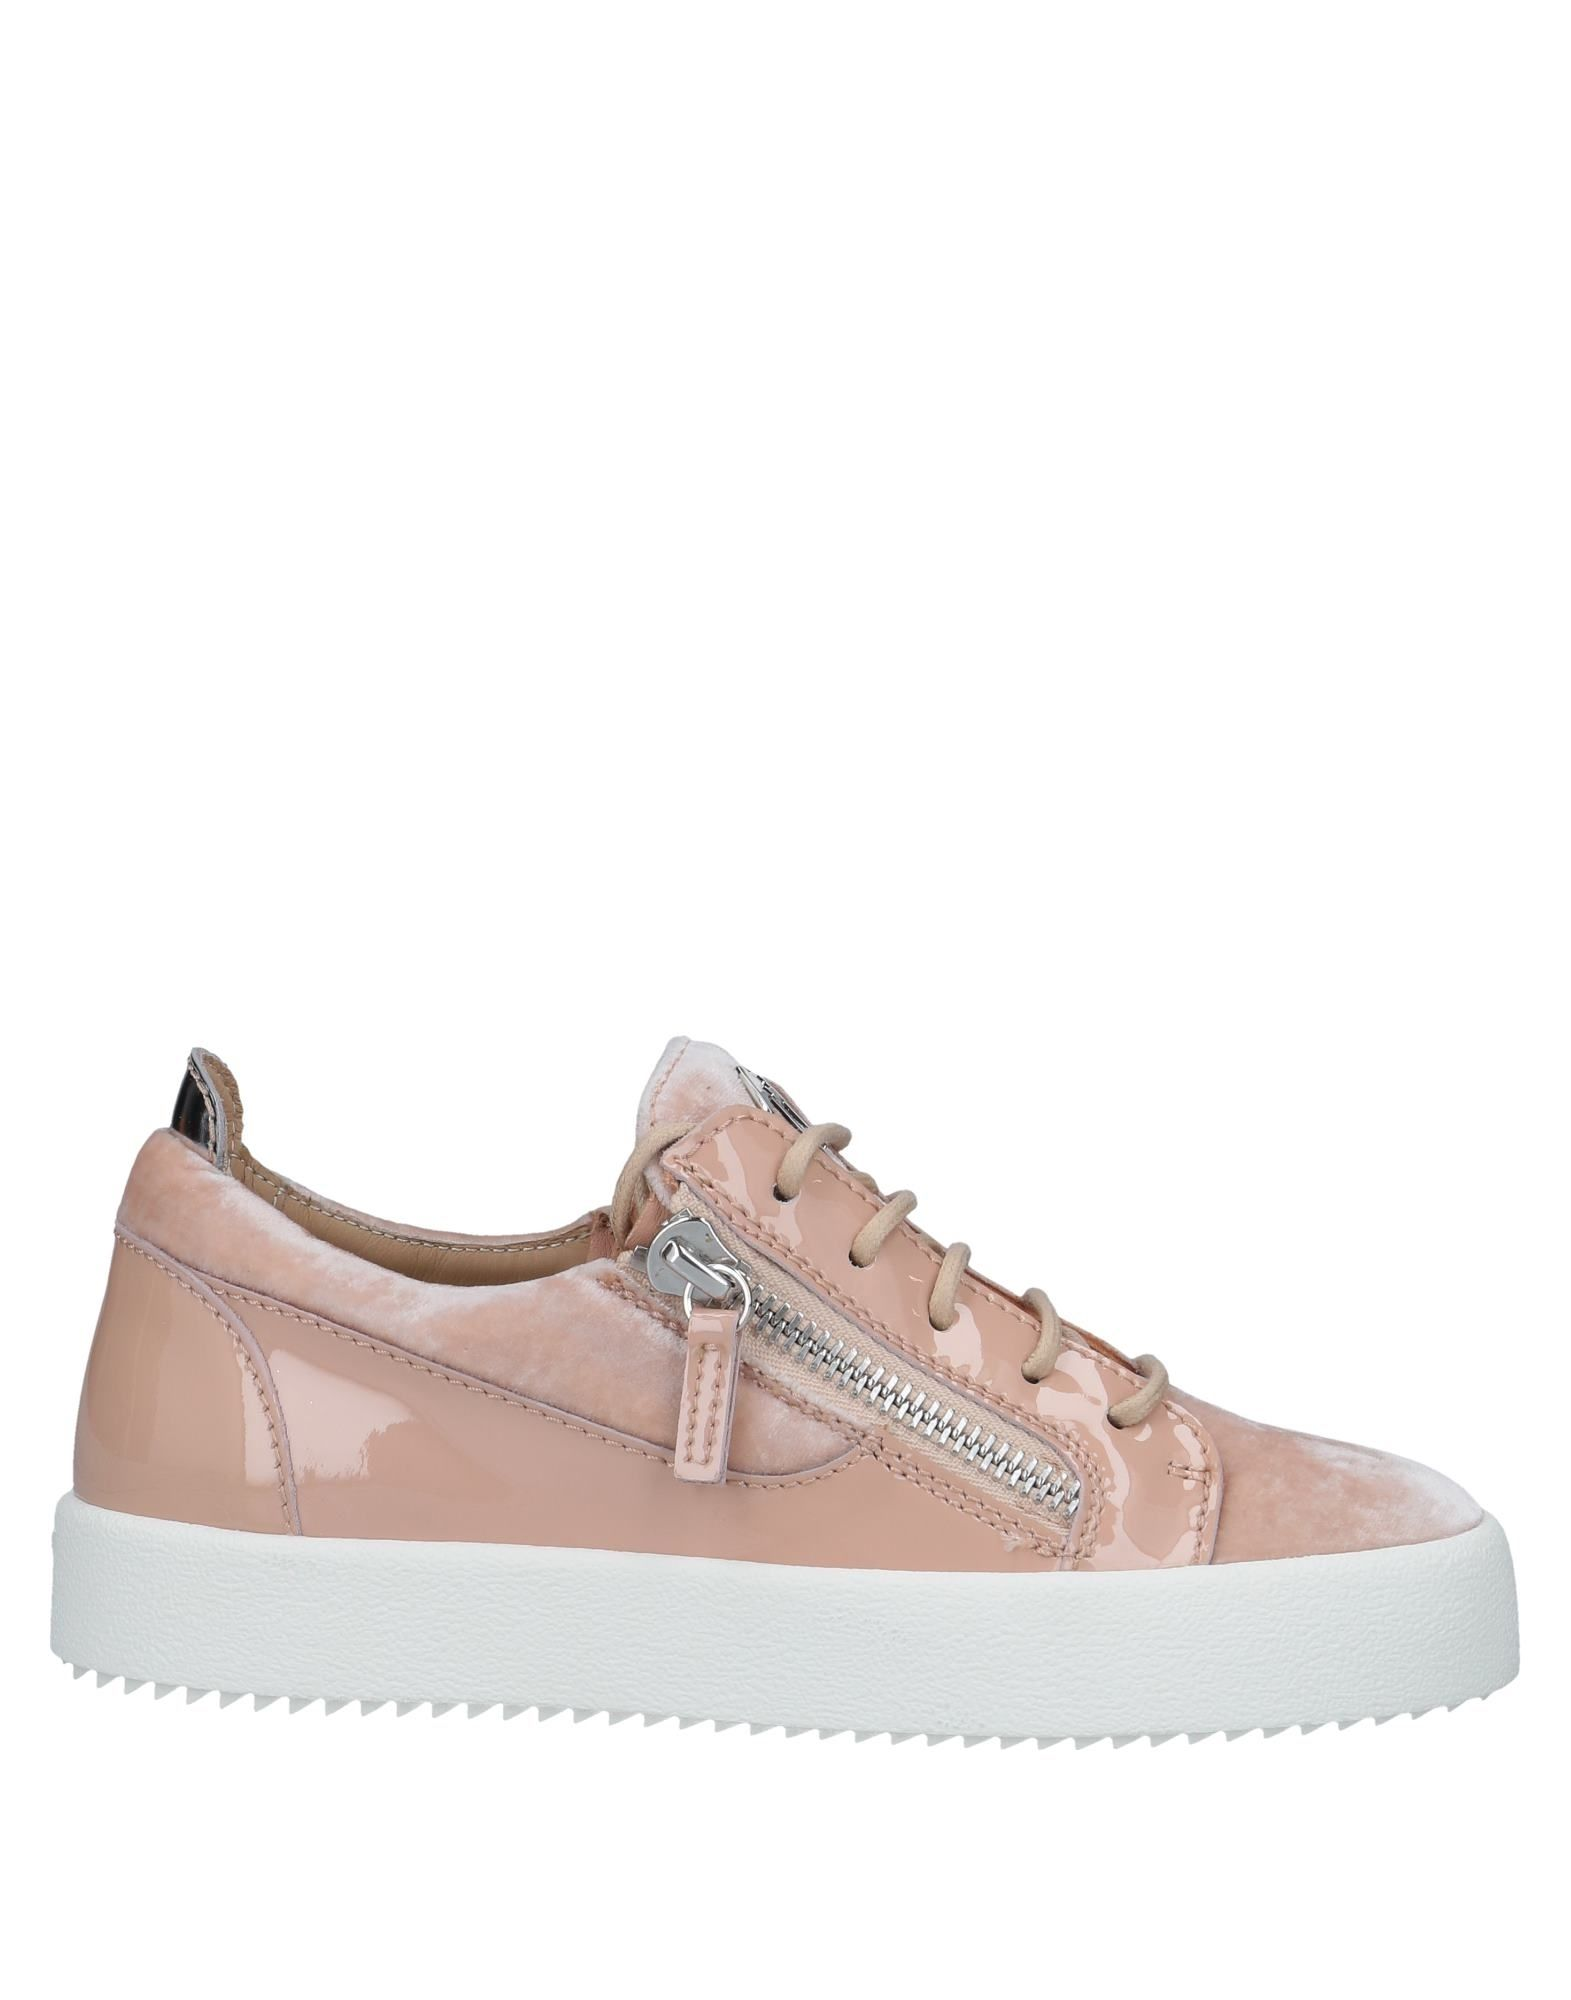 Giuseppe Giuseppe Zanotti Sneakers - Women Giuseppe Giuseppe Zanotti Sneakers online on  Canada - 11549302TC 43ed3e